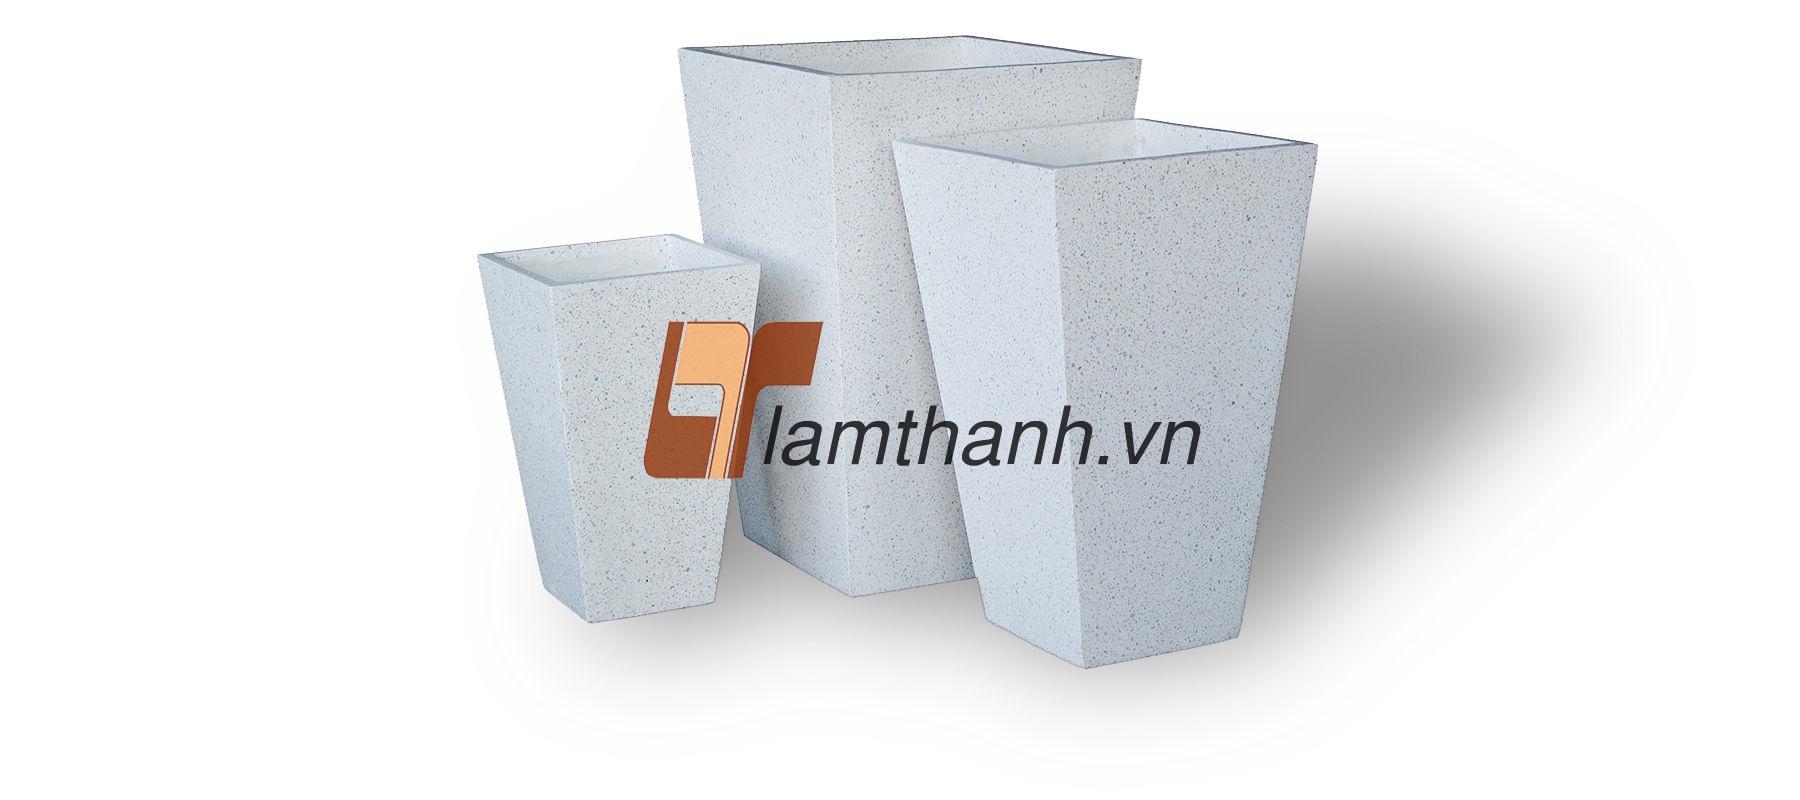 vietnam terrazzo, concrete 01